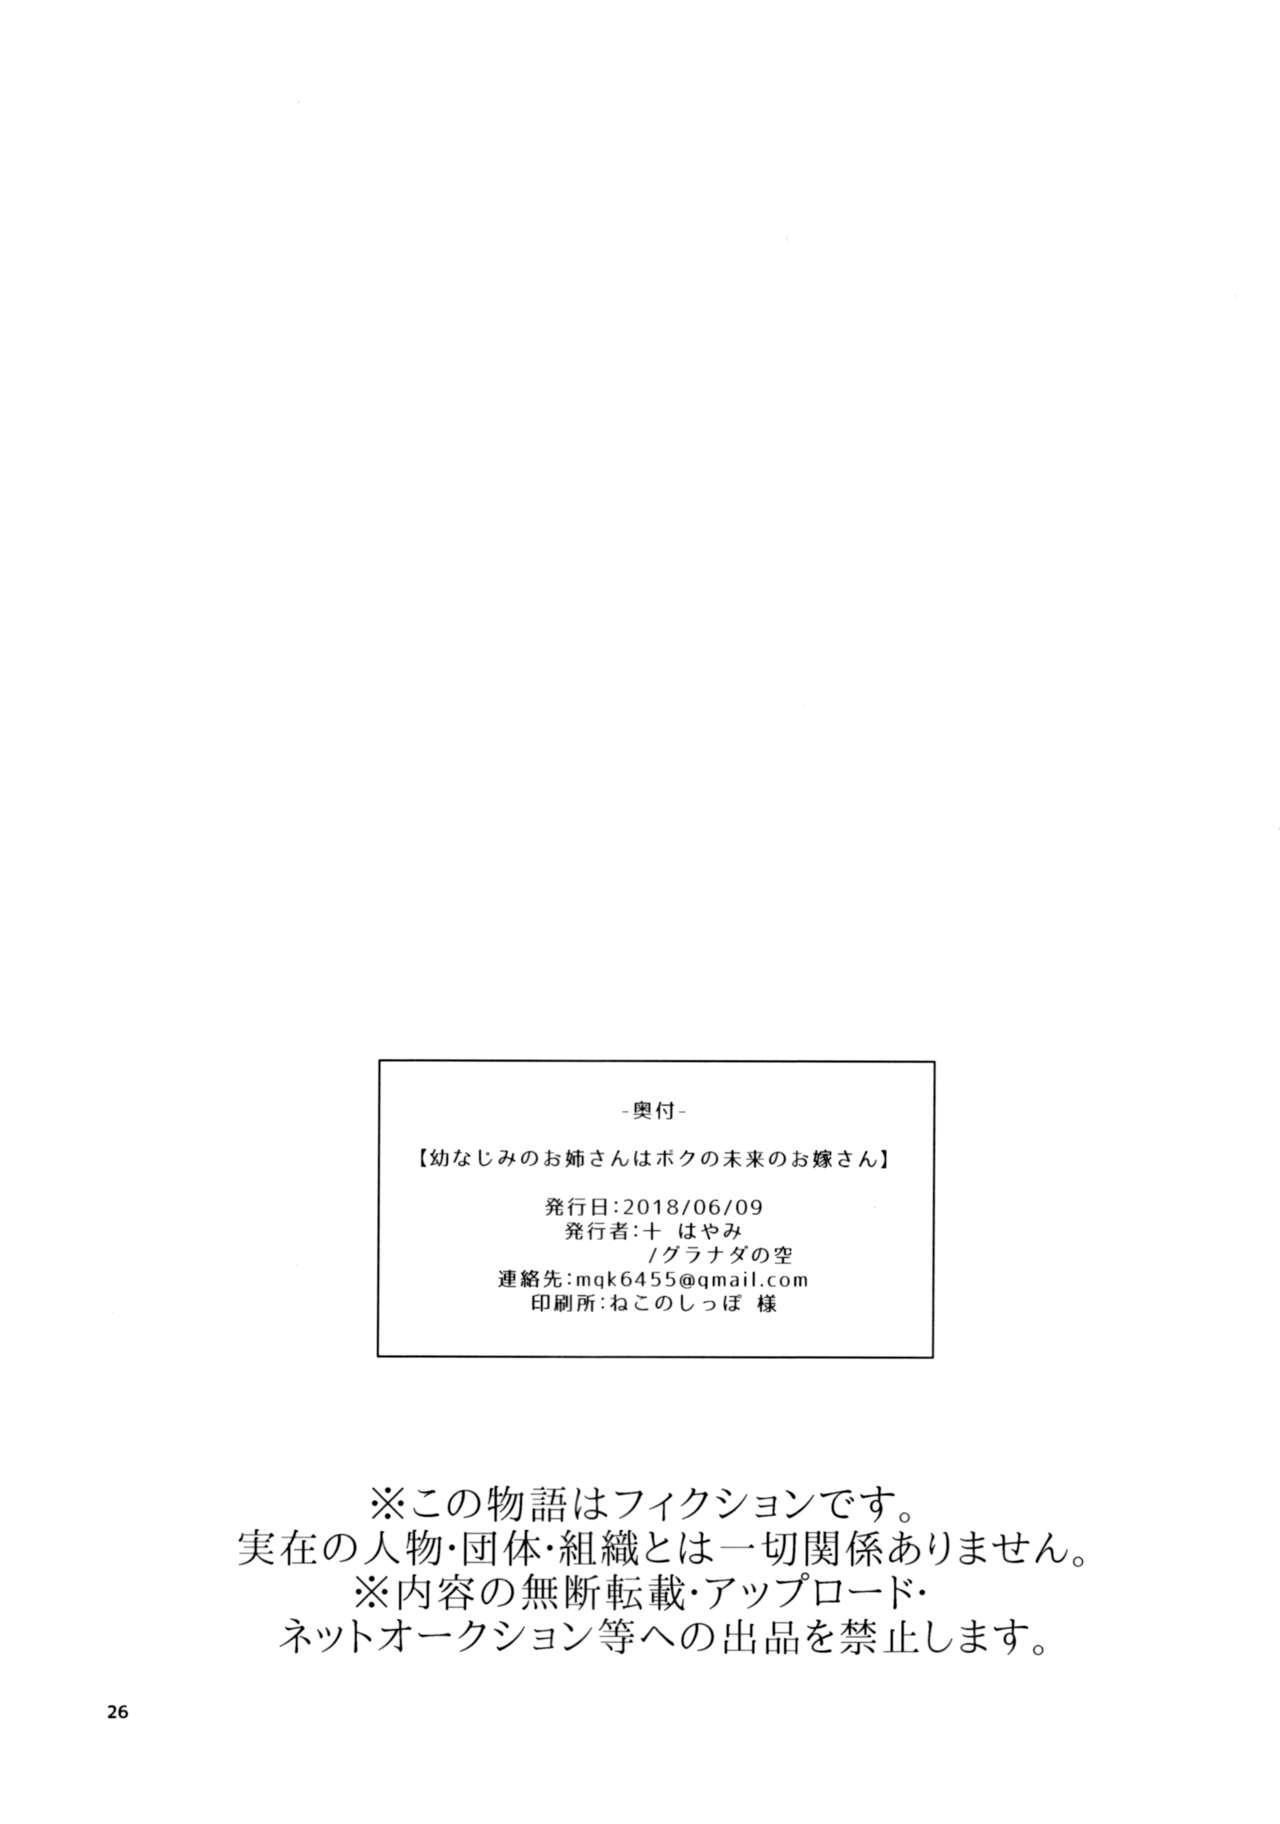 (Futaket 14) [Granada Sky (Mogiki Hayami)] Osananajimi no Onee-san wa Boku no Mirai no Oyome-san | 邻家的大姐姐是我未来的新娘 [Chinese] [黄记汉化组] 25